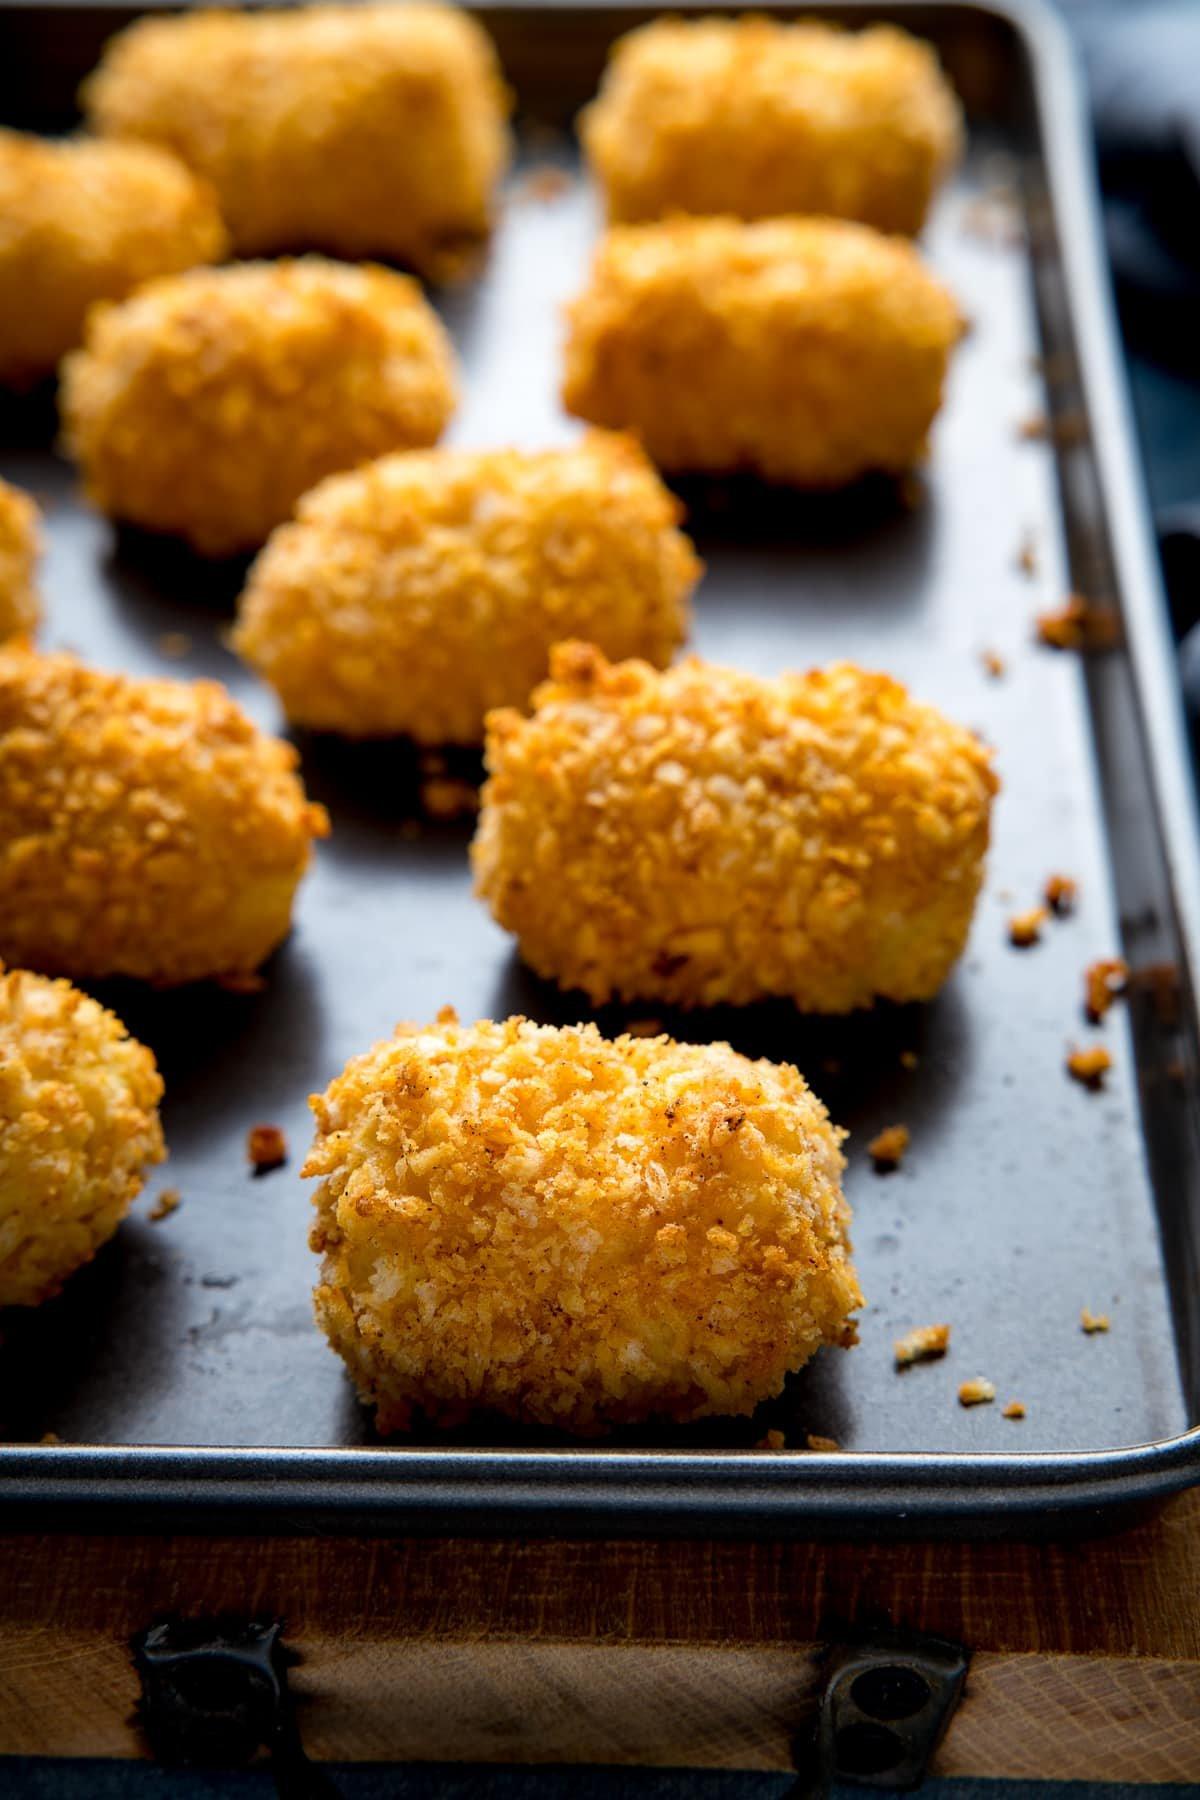 potato croquettes on a baking tray